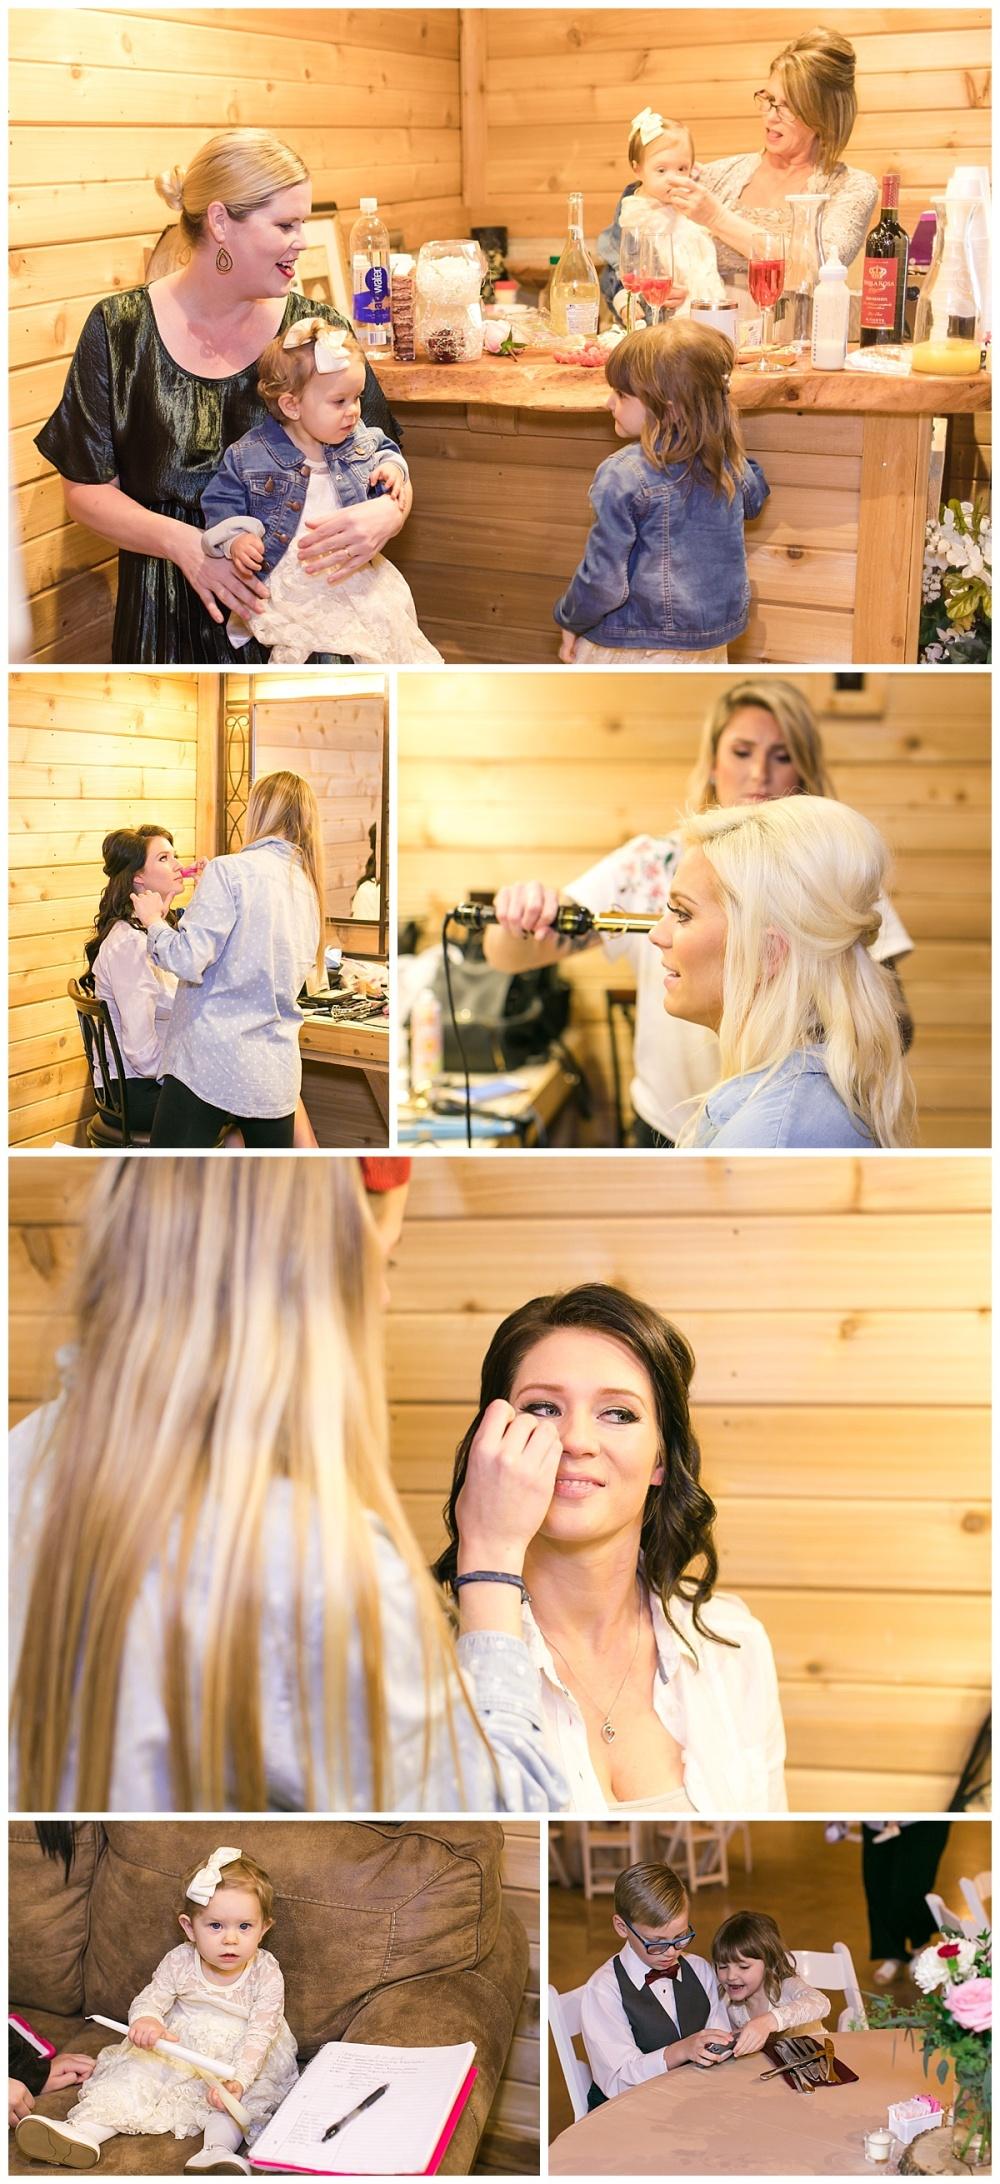 Carly-Barton-Photography-Geronimo-Oaks-Wedding-Venue-Texas-Hill-Country-Ronnie-Sarah_0083.jpg